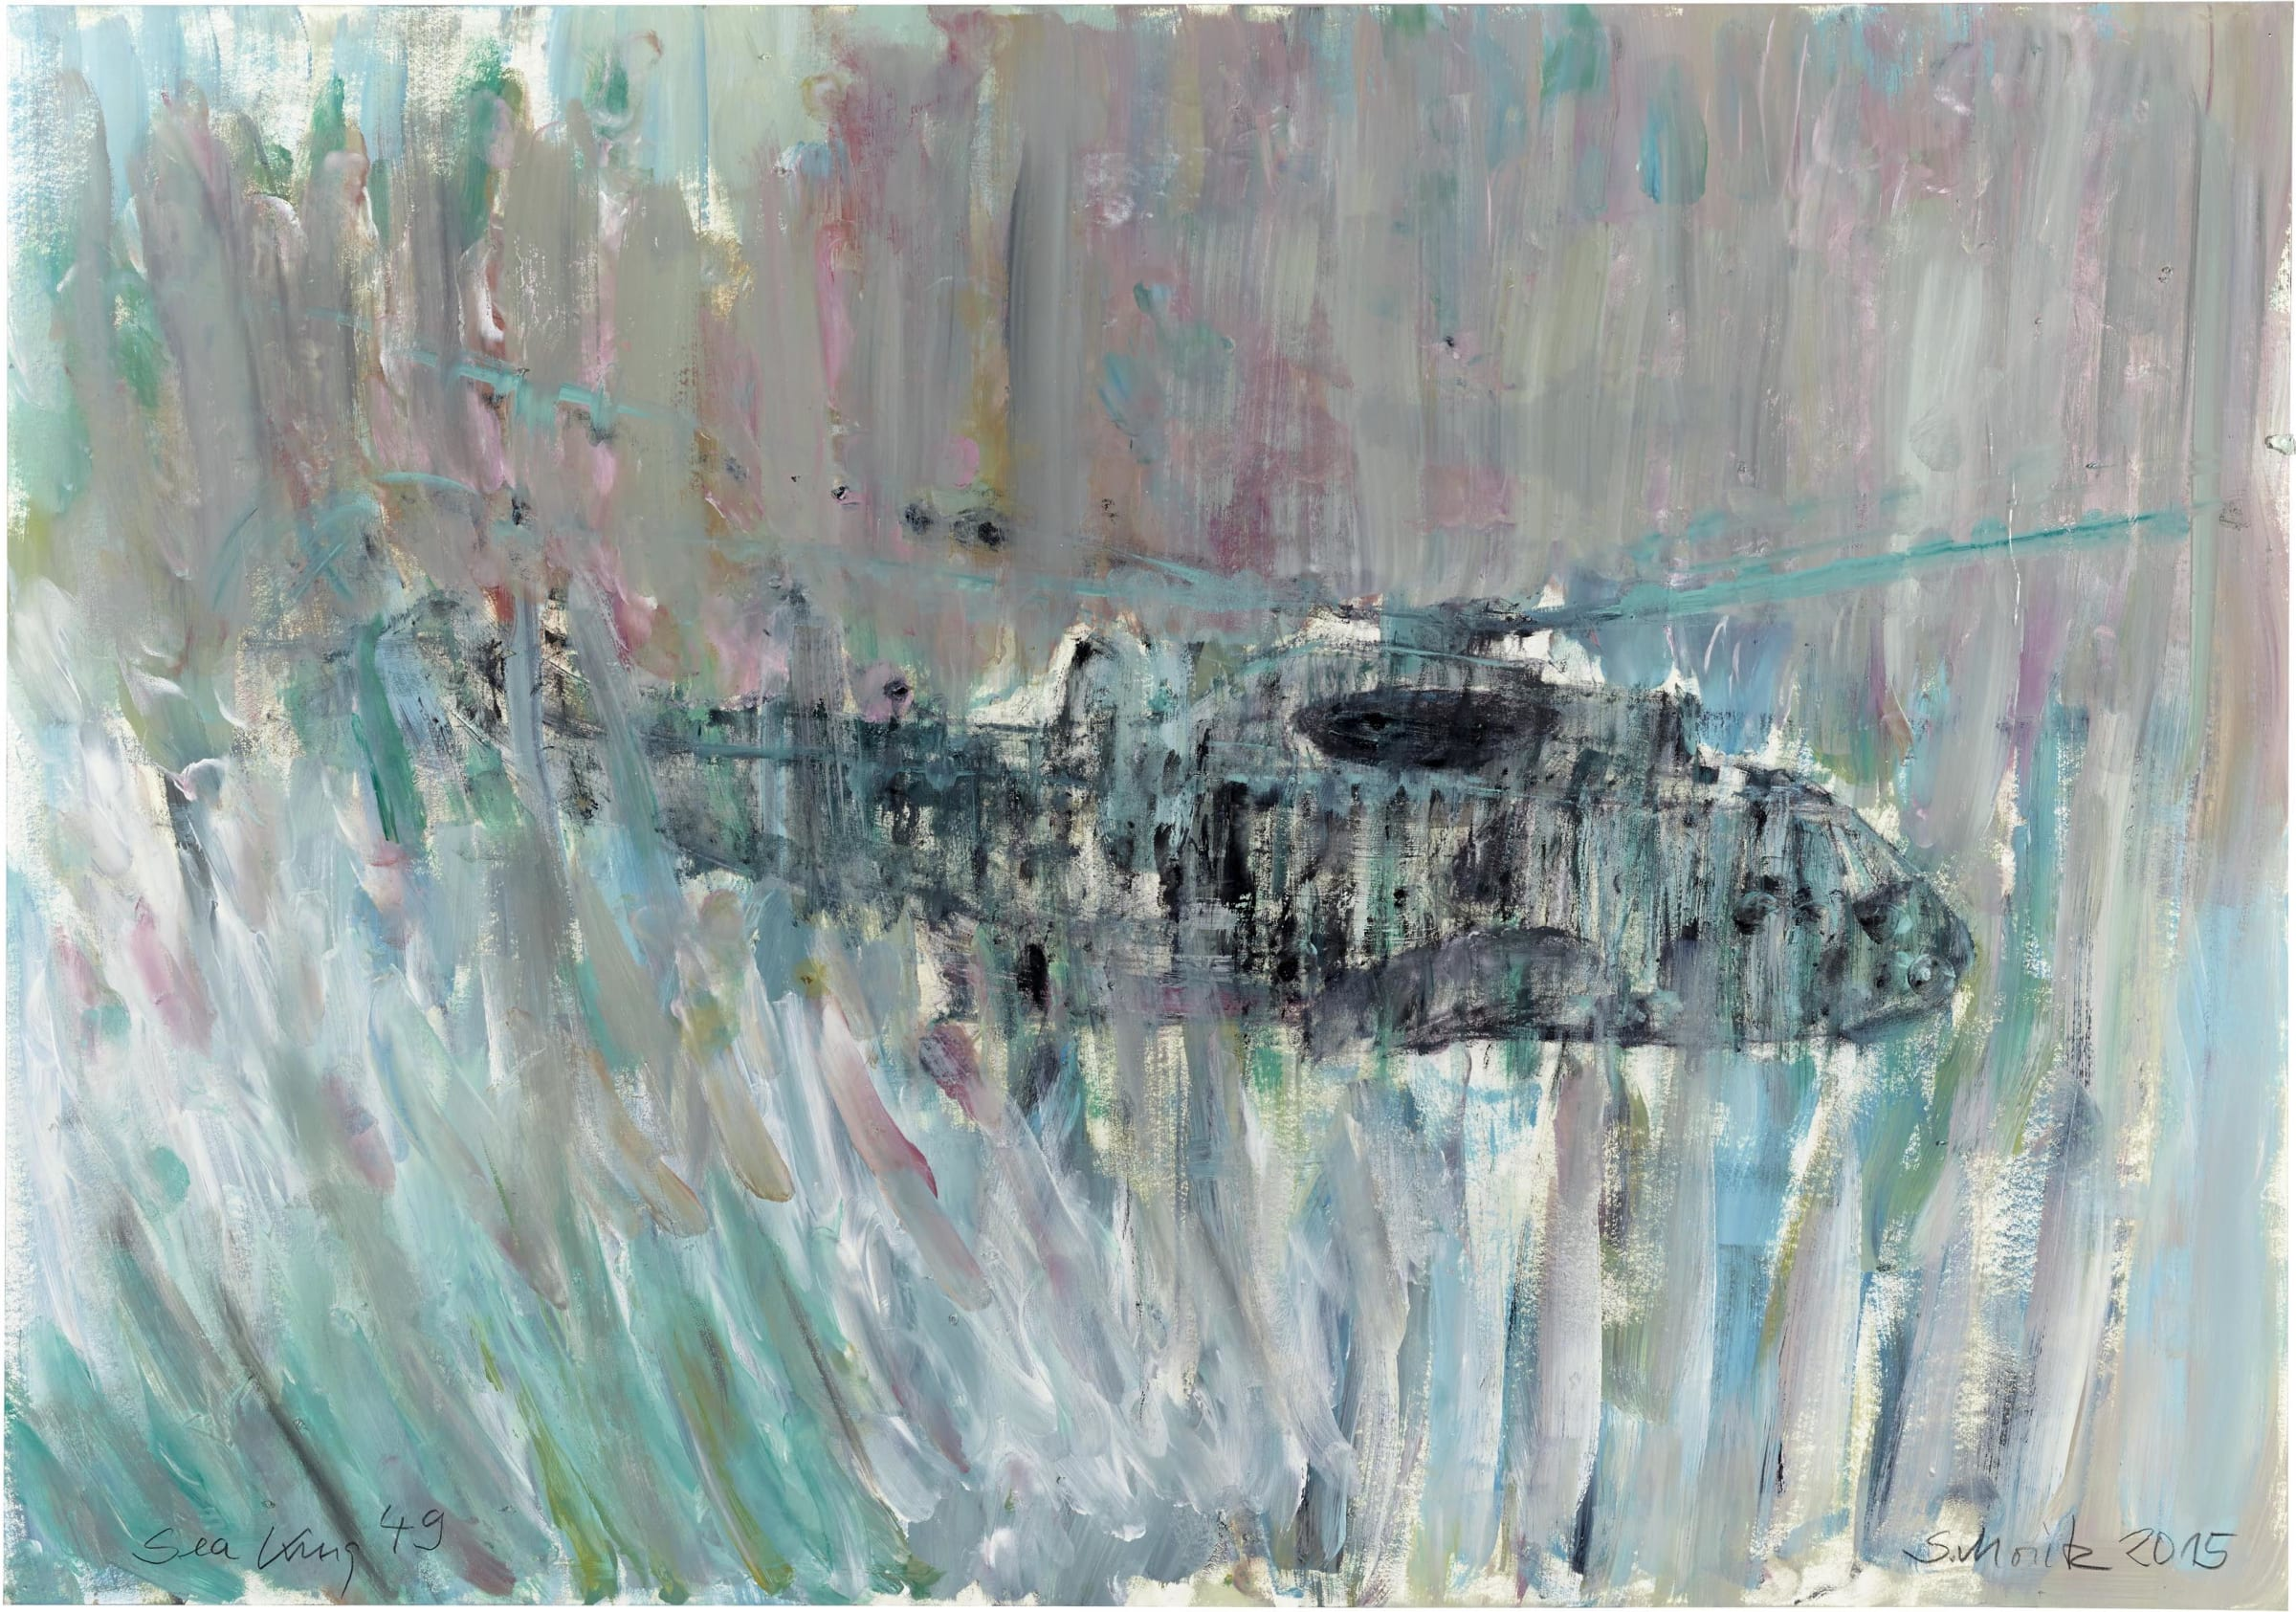 Sabine Moritz, Sea King 49, 2015